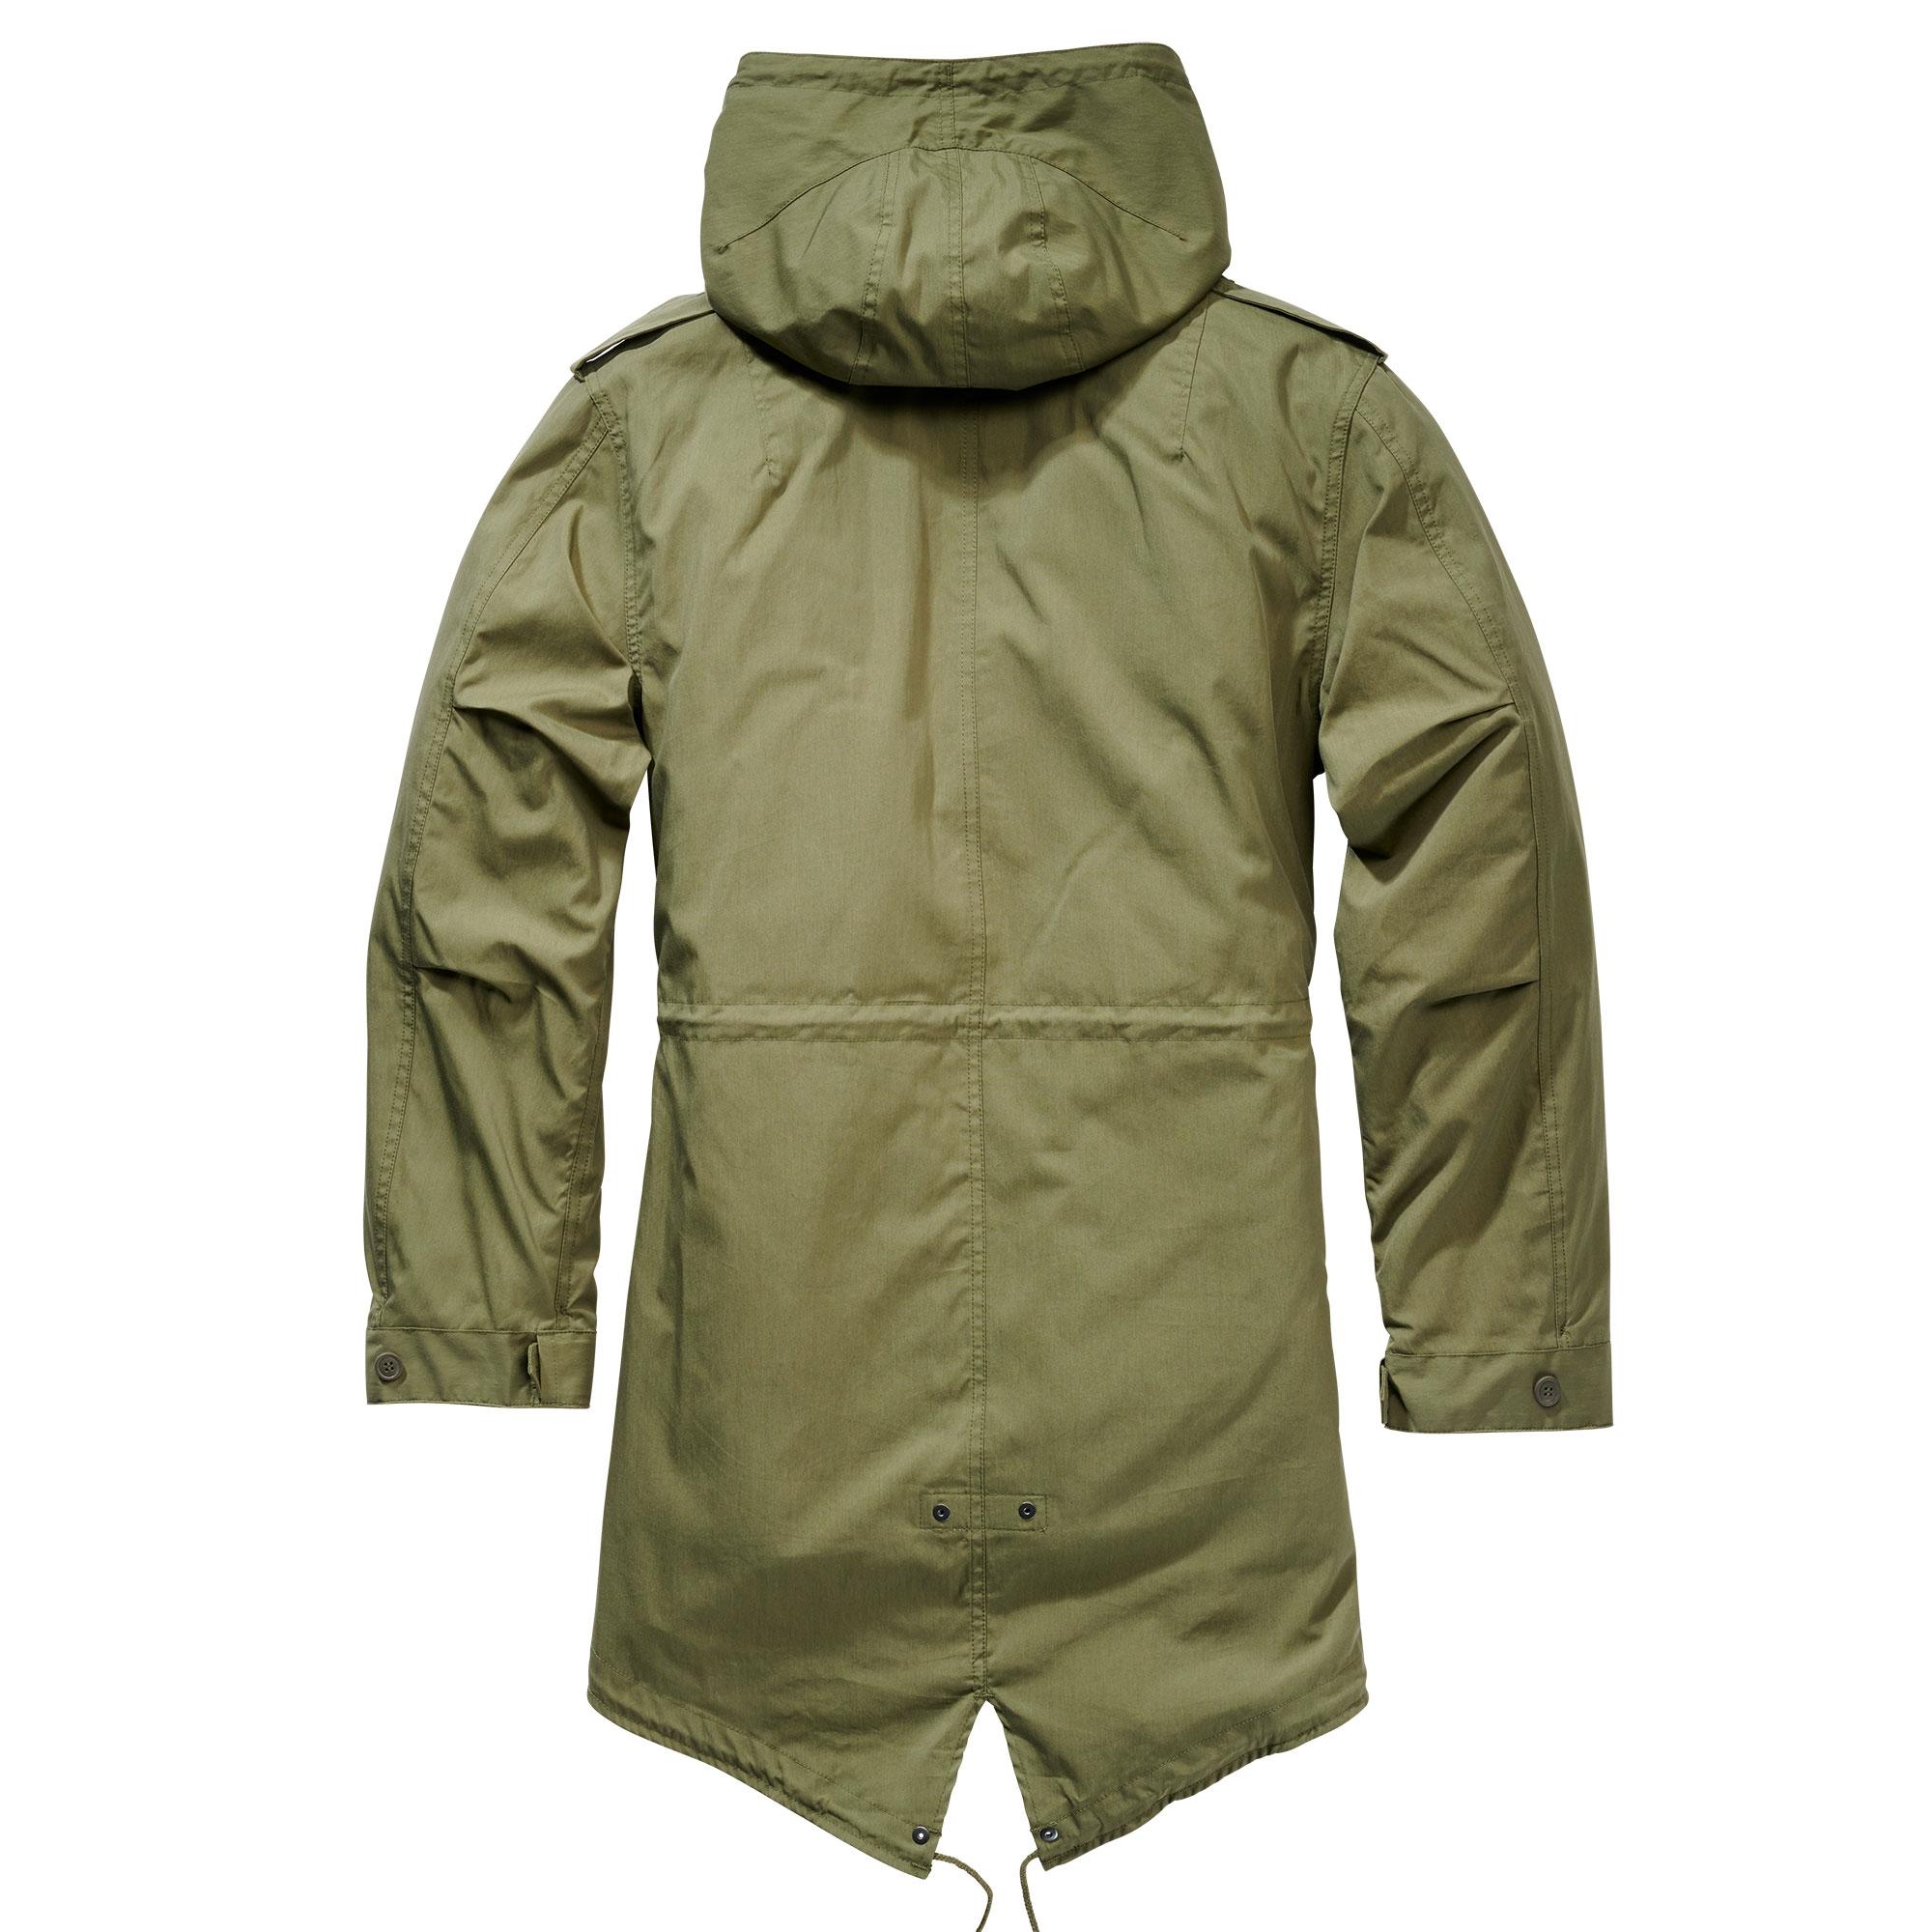 Indexbild 9 - Brandit US M51 Parka Winterjacke Fishtail Jacke Gefüttert Armee S-5XL